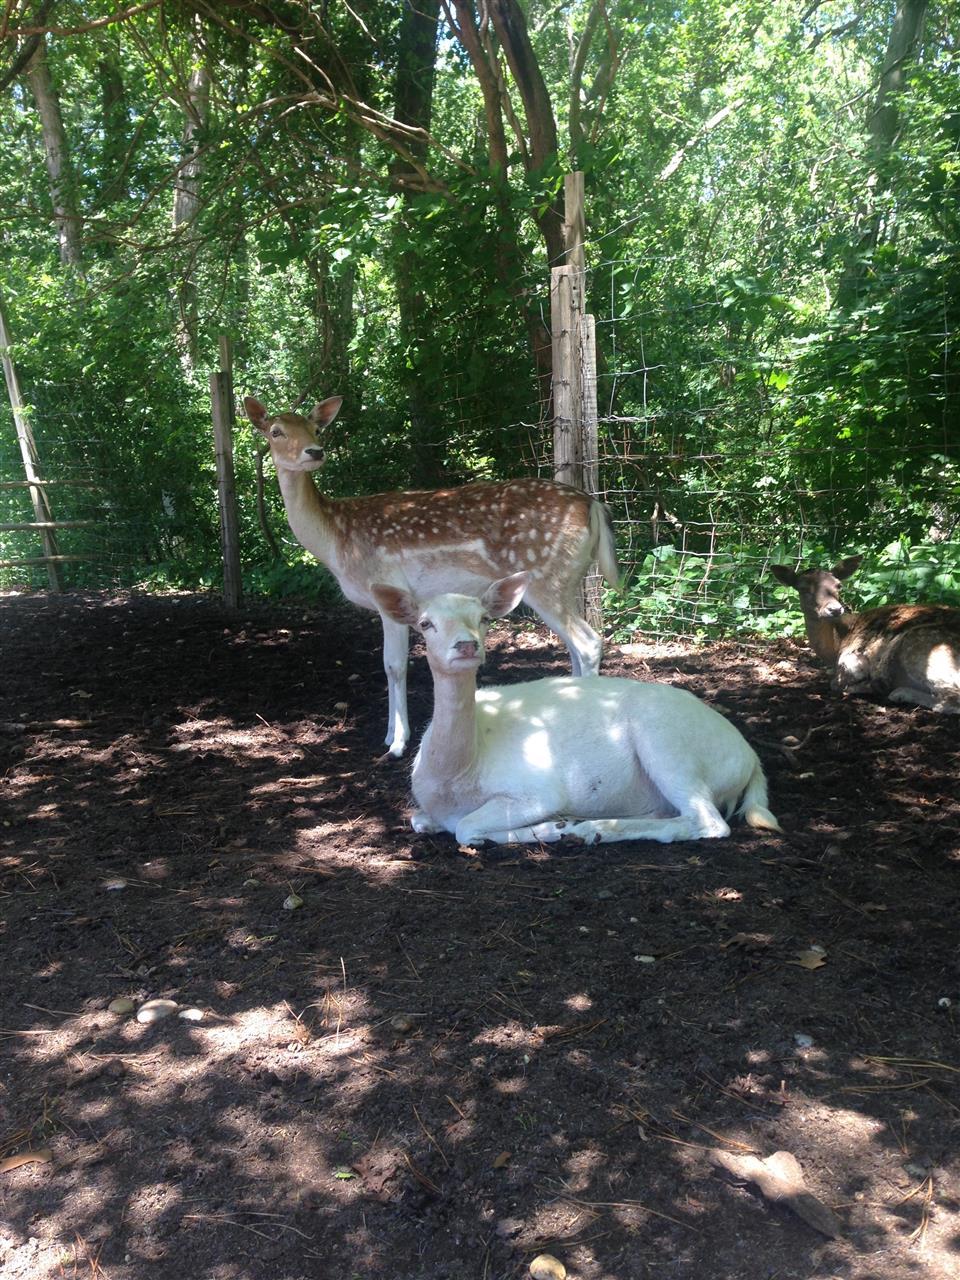 #Deer #LongIsland